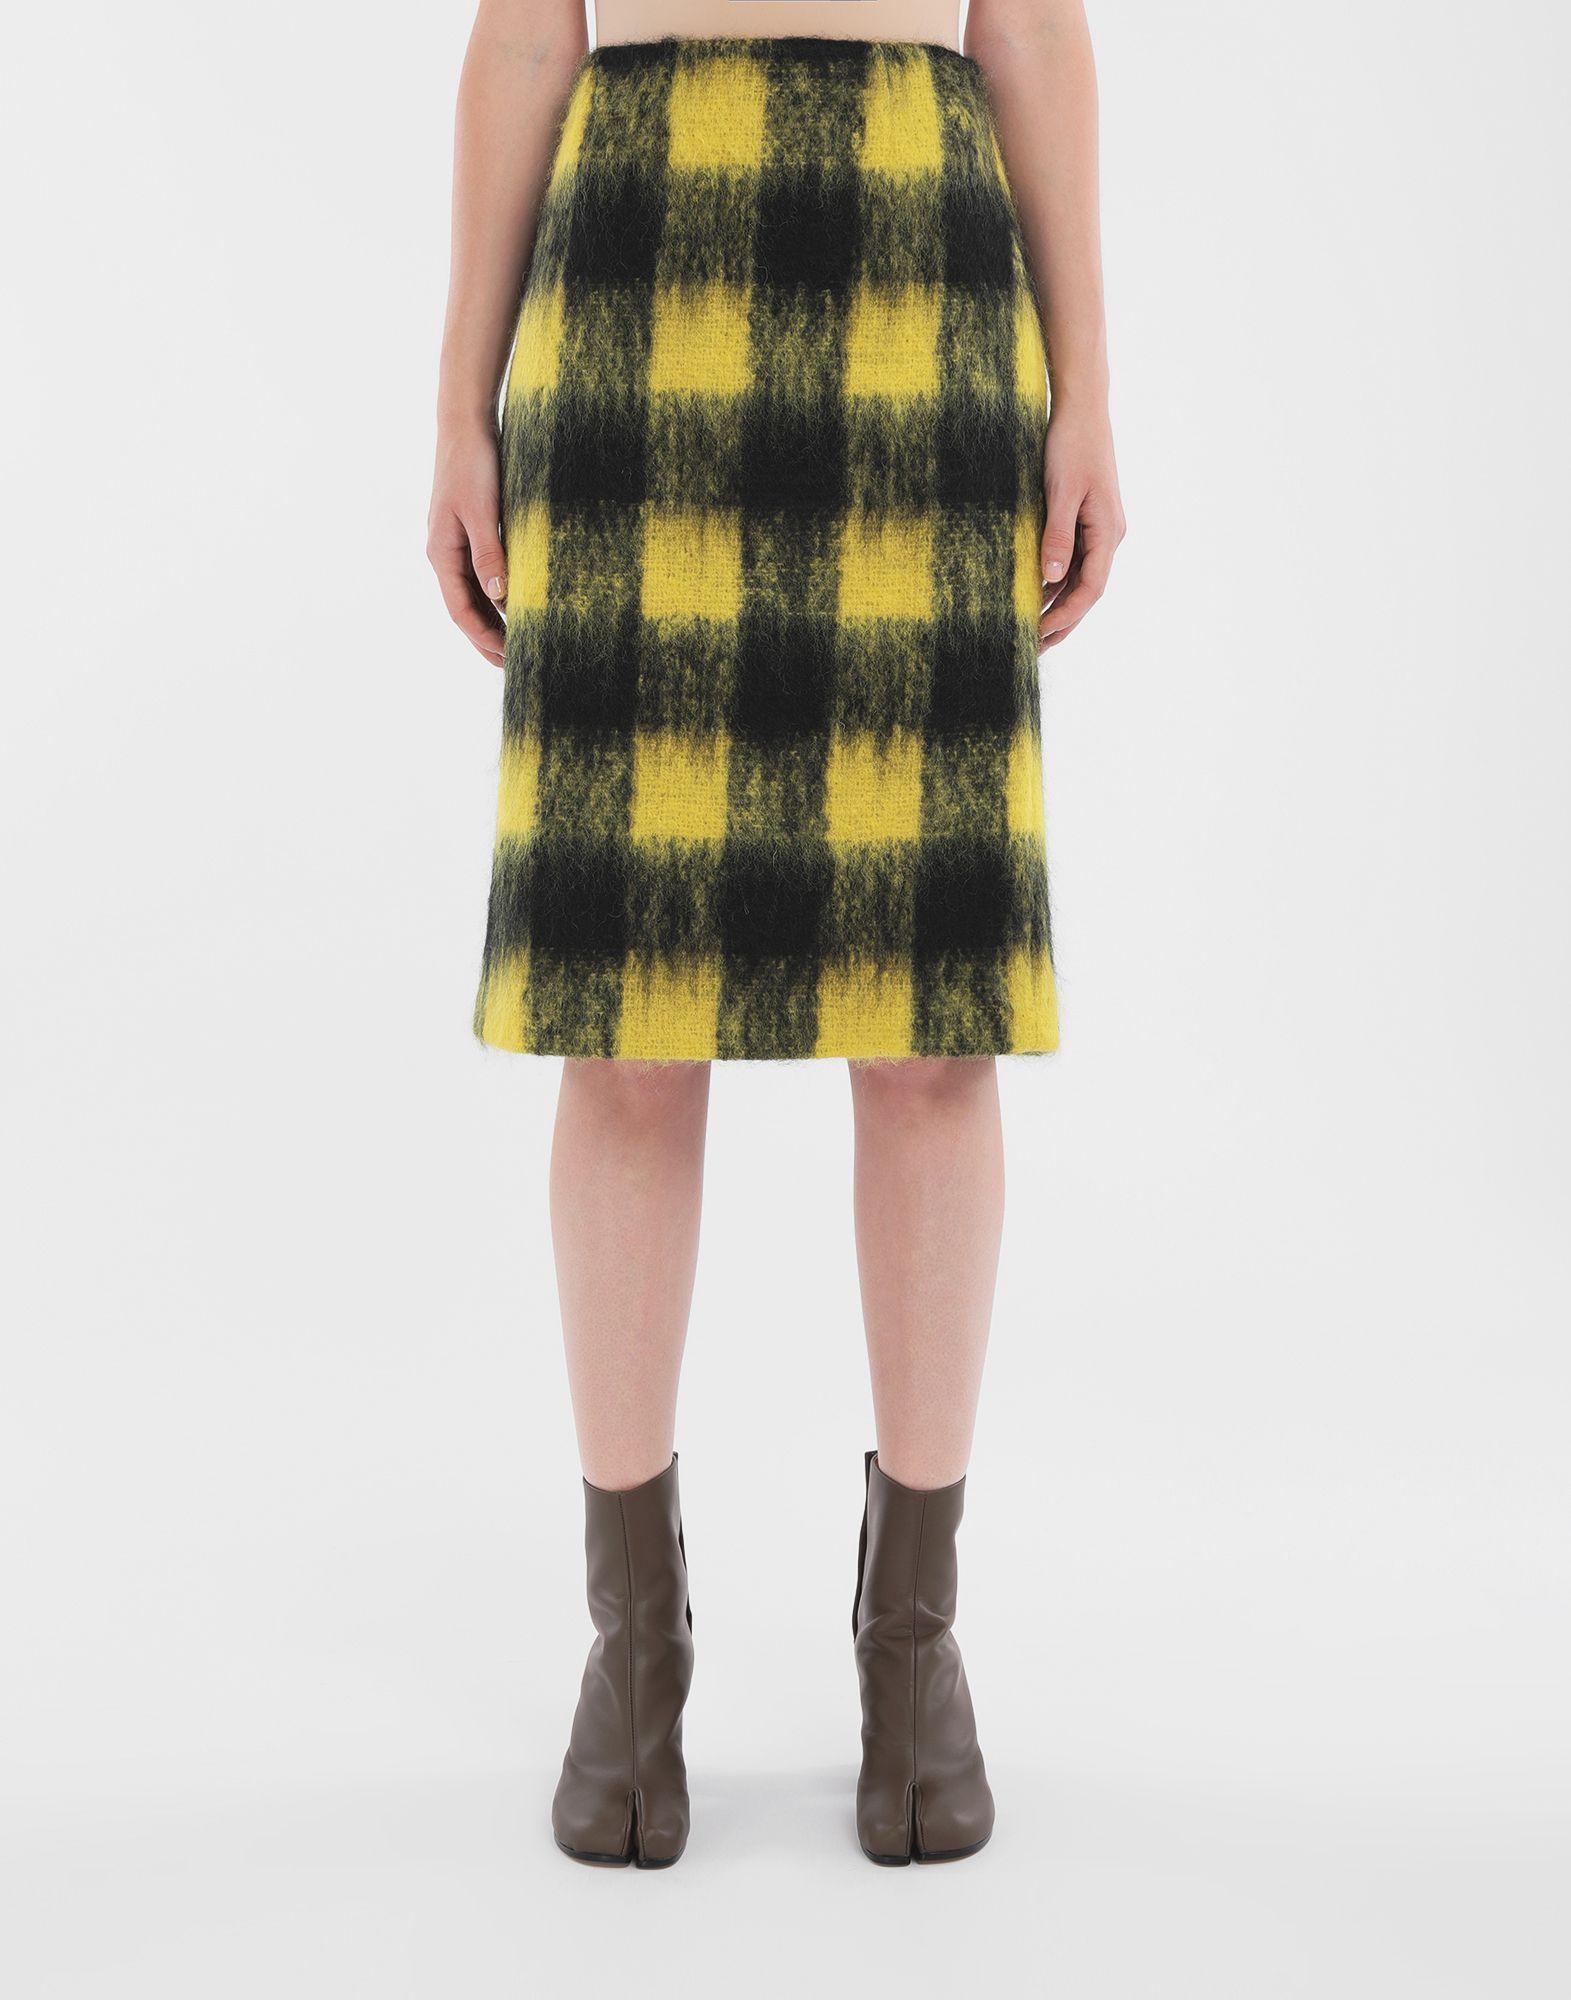 MAISON MARGIELA Mohair check skirt 3/4 length skirt Woman r